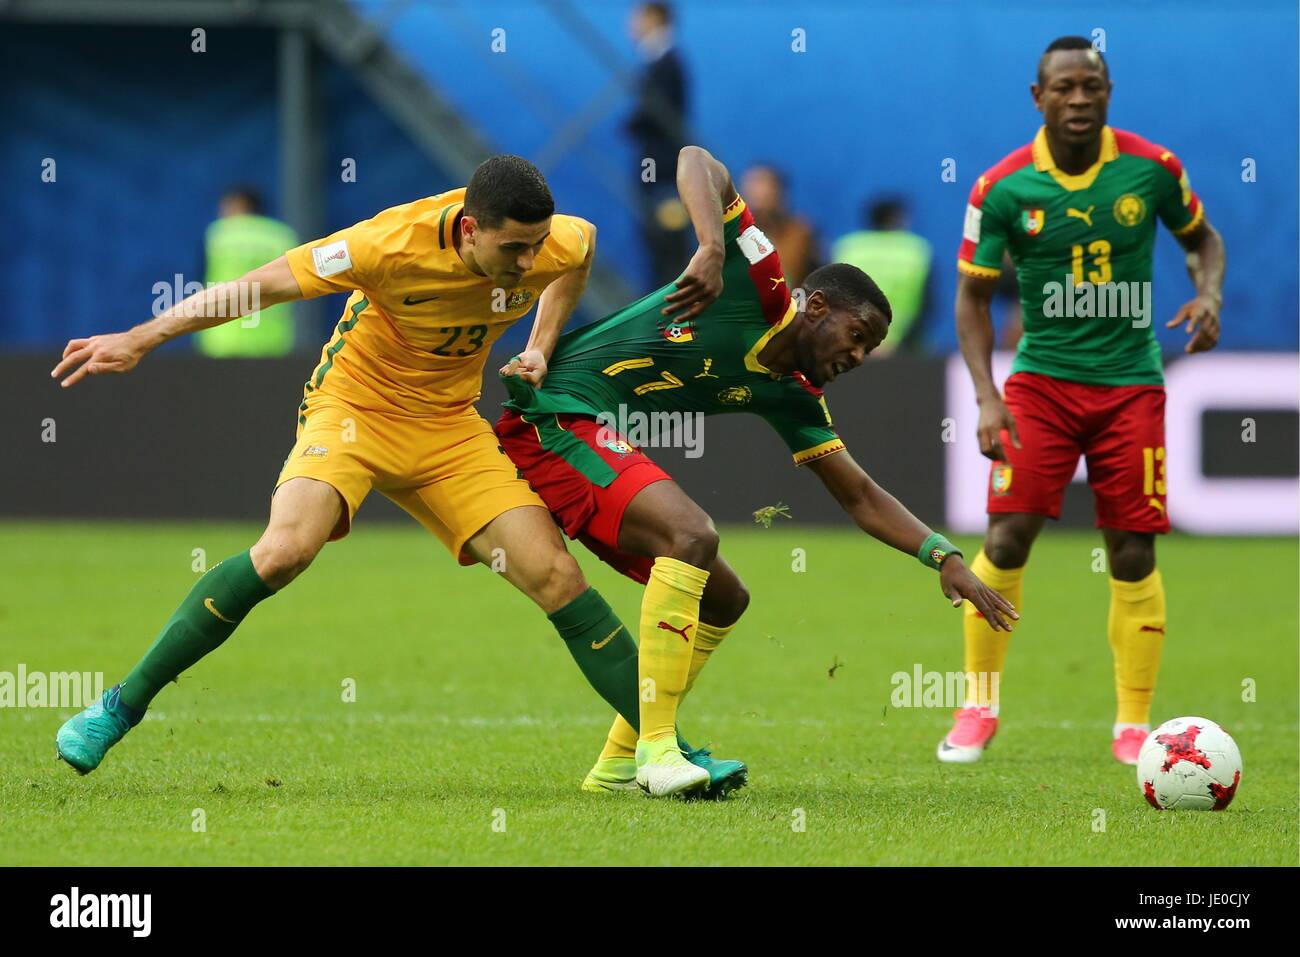 St Petersburg, Russia. 22nd June, 2017. Australia's Tom Rogic, Cameroon's Arnaud Djoum and Christian Bassogog - Stock Image